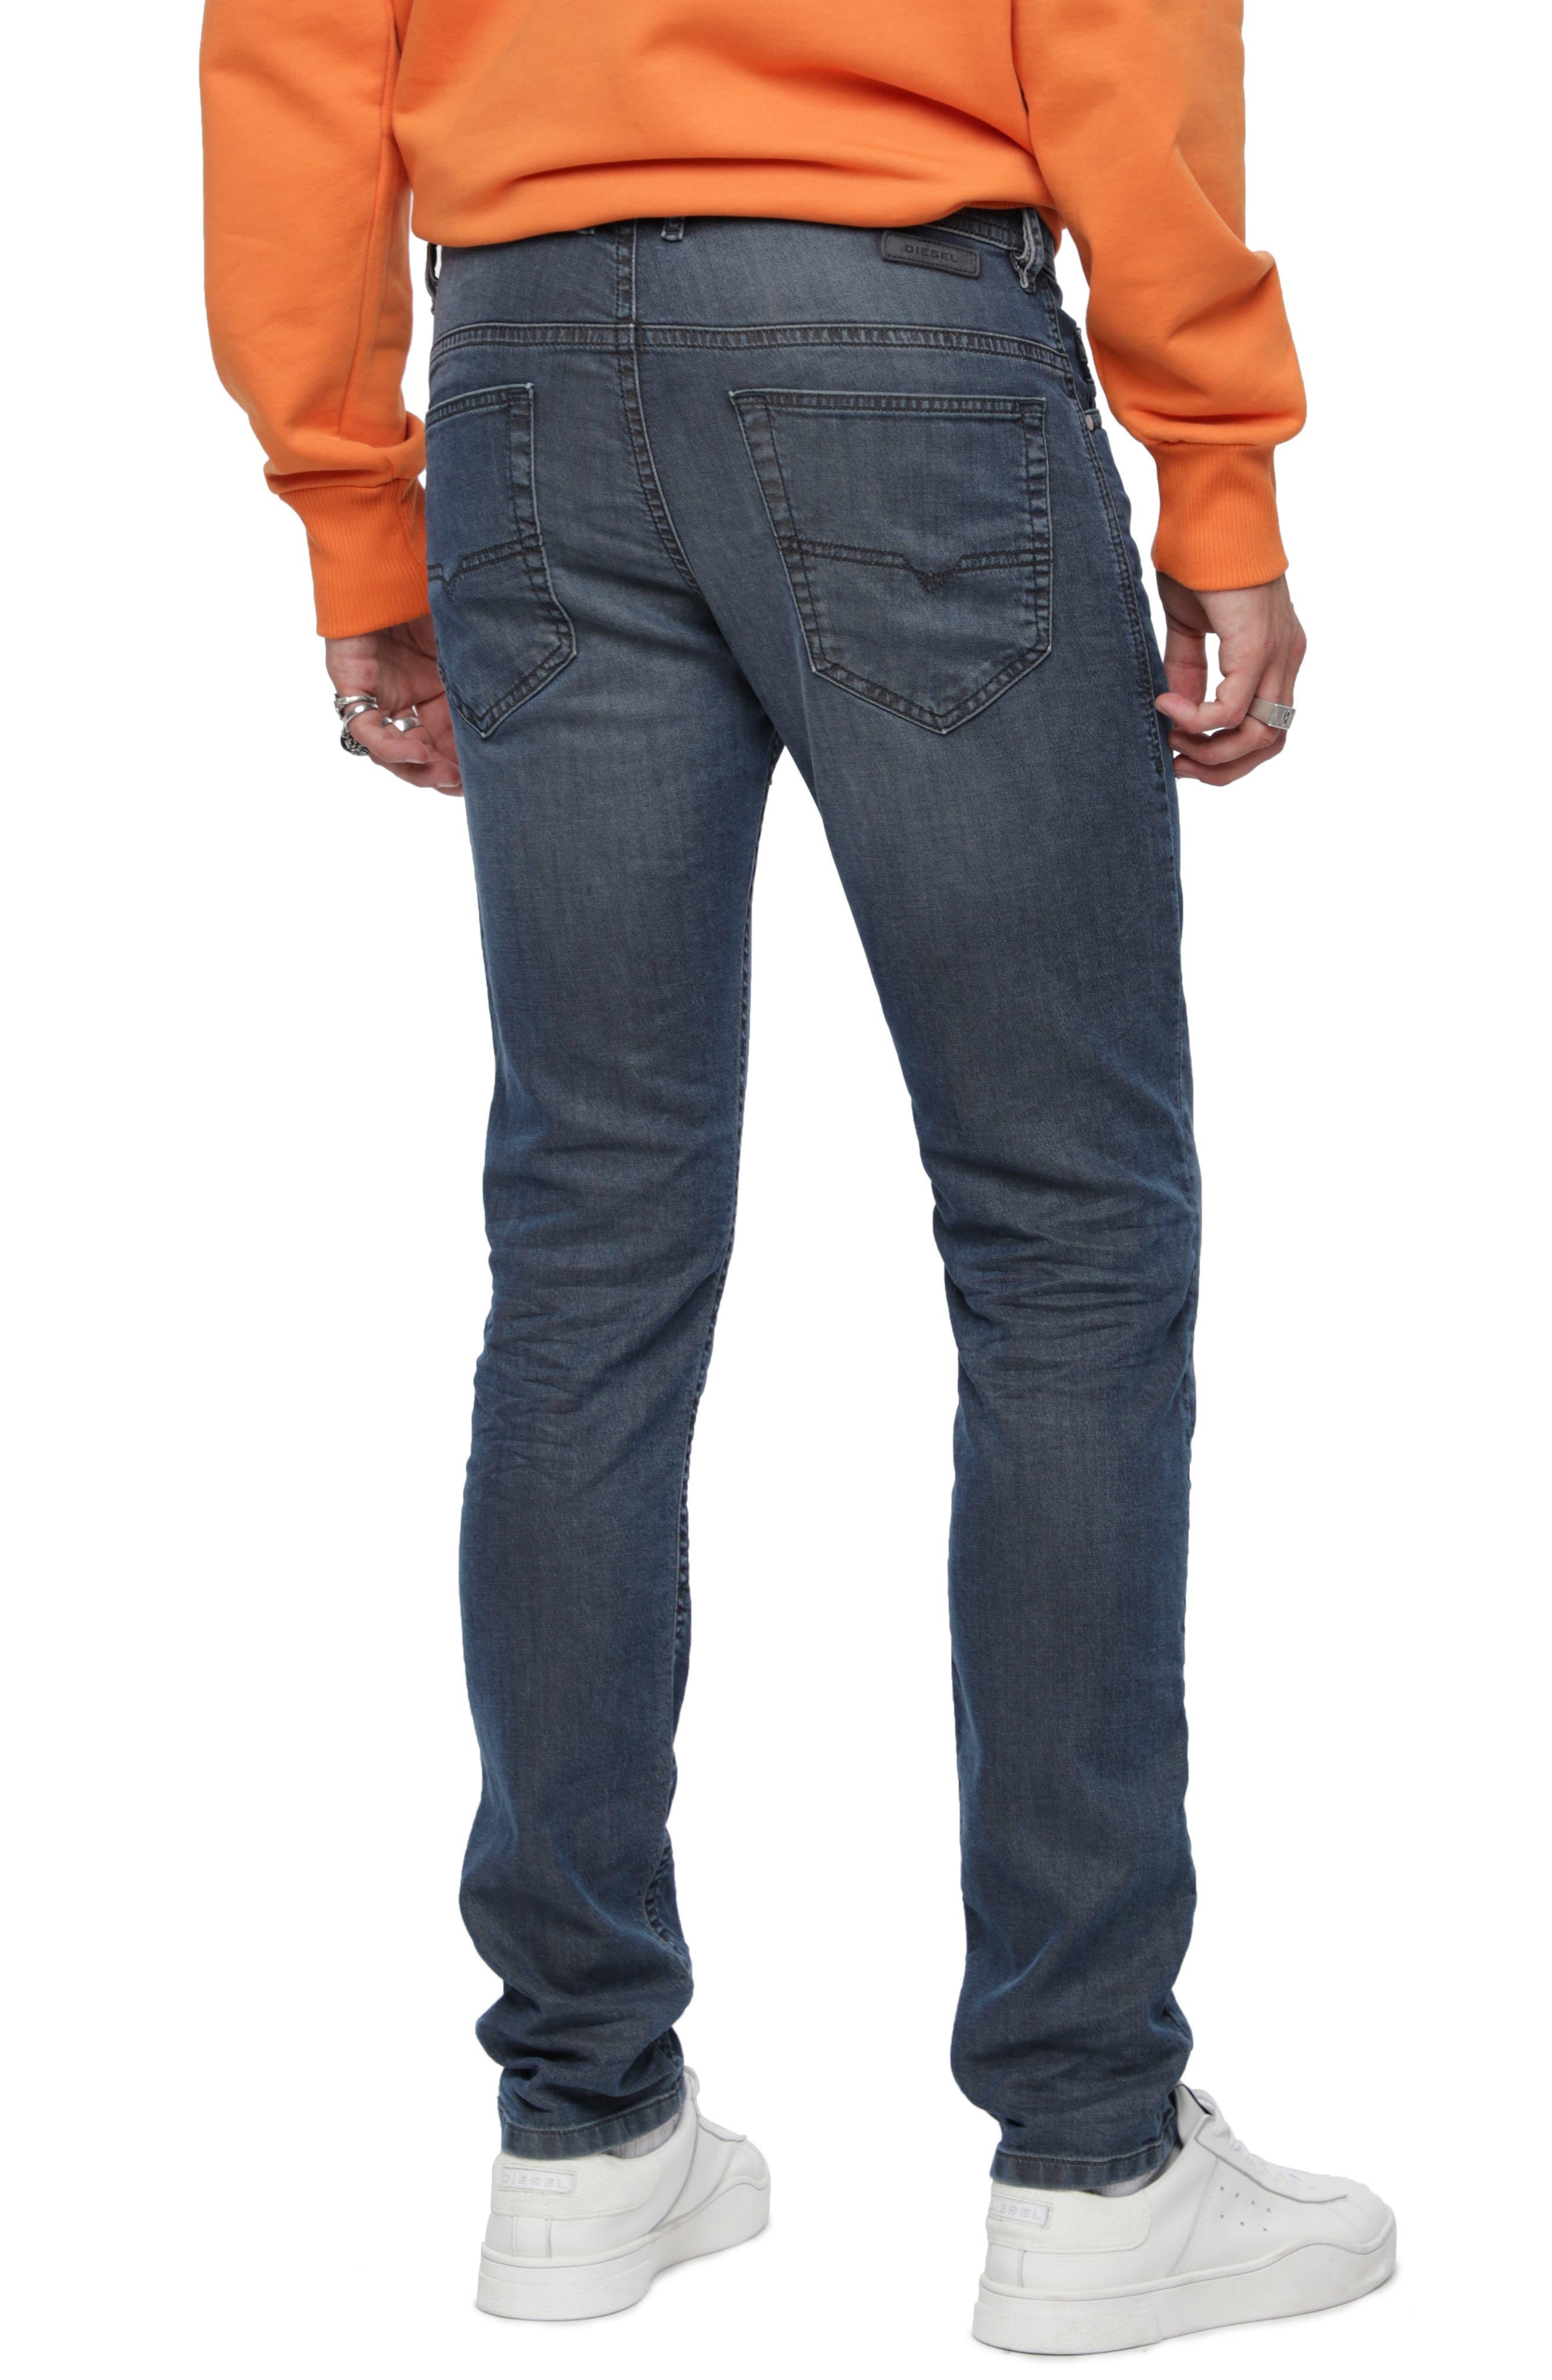 Thommer Slim Fit Jeans,                             Alternate thumbnail 2, color,                             084ZJ